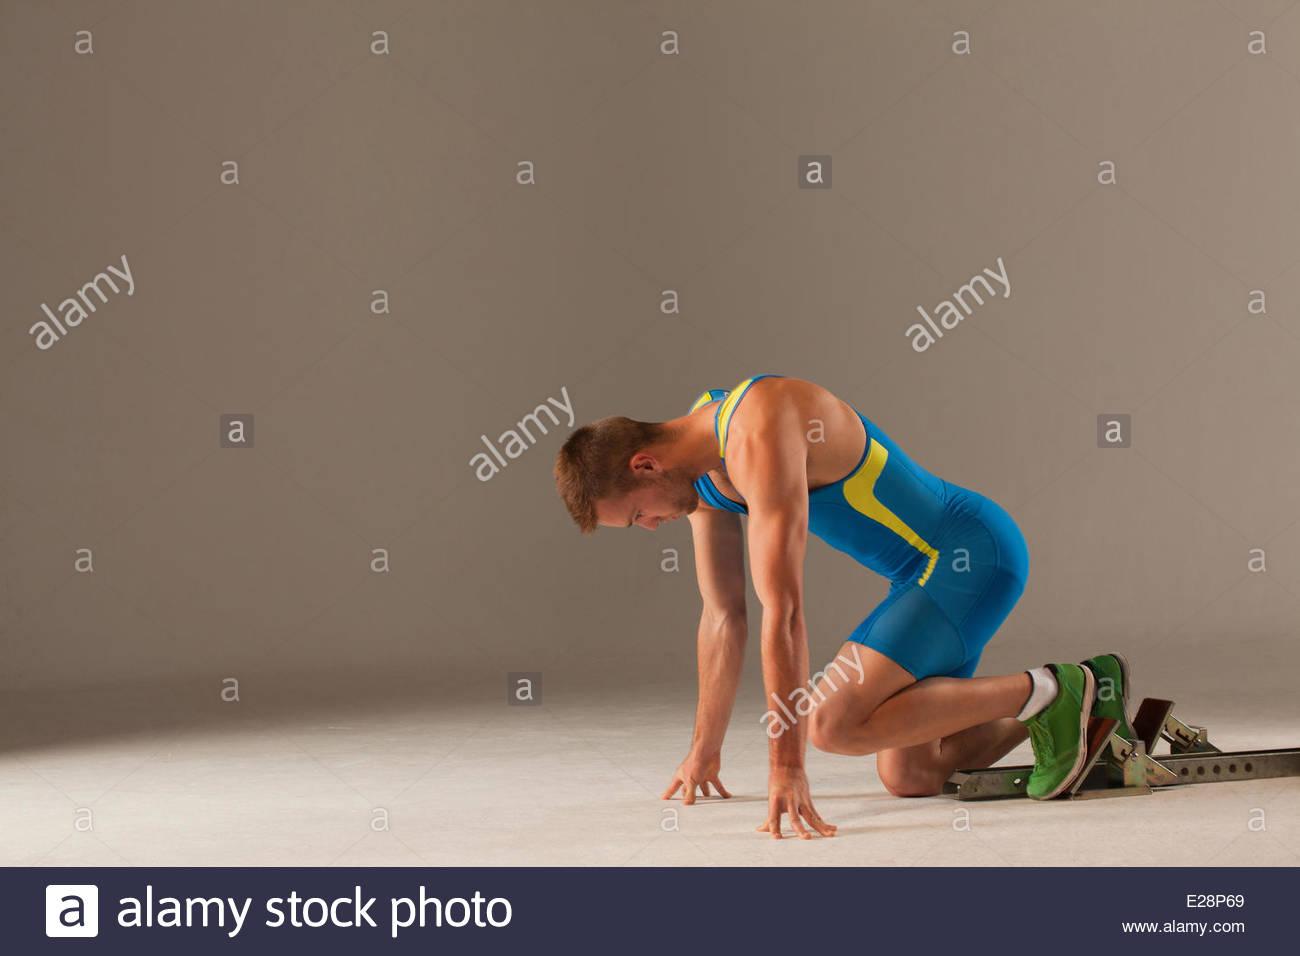 Athlete in starting blocks - Stock Image